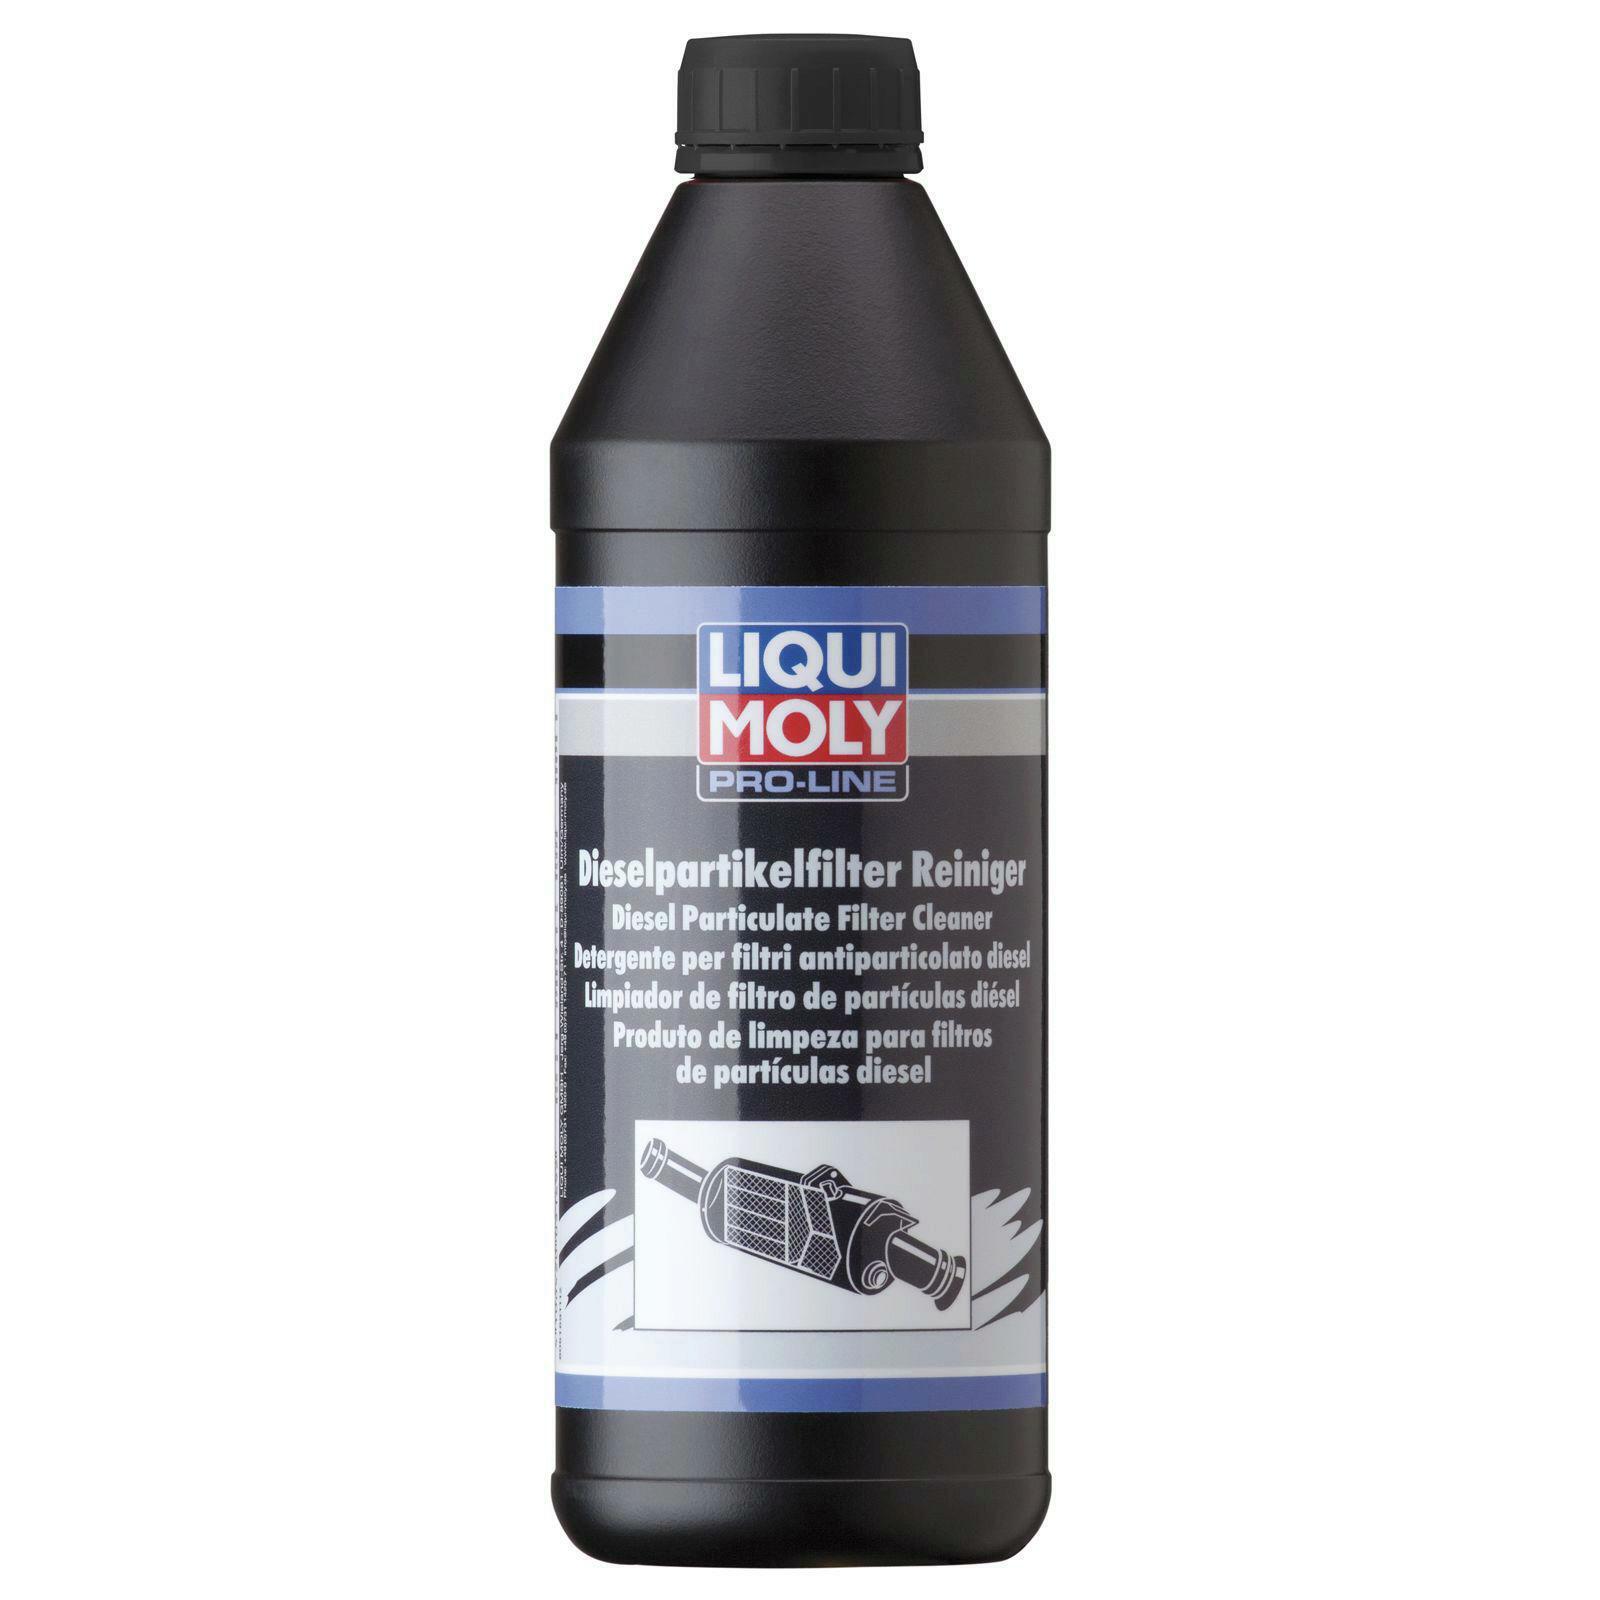 Liqui Moly Pro-Line Dieselpartikelfilter-Reiniger 1l